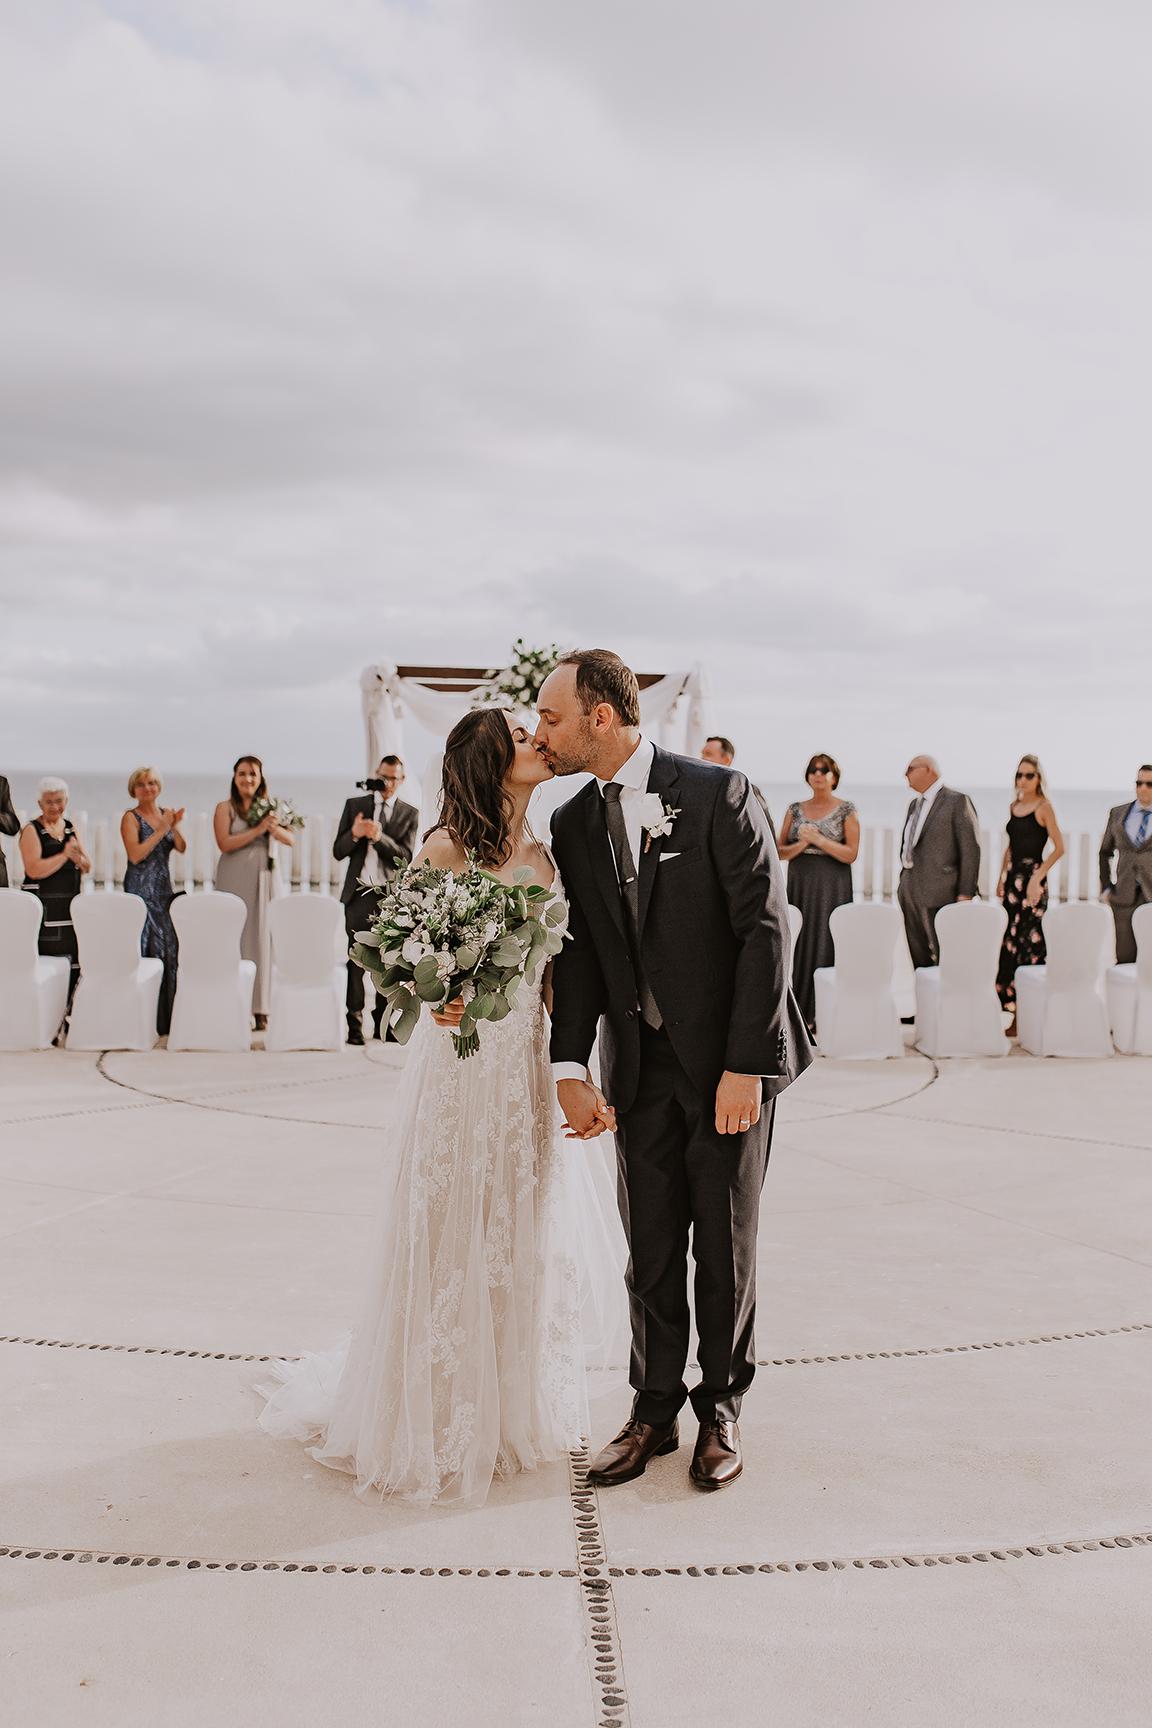 Lindsei+James_cabo_wedding_559.jpg